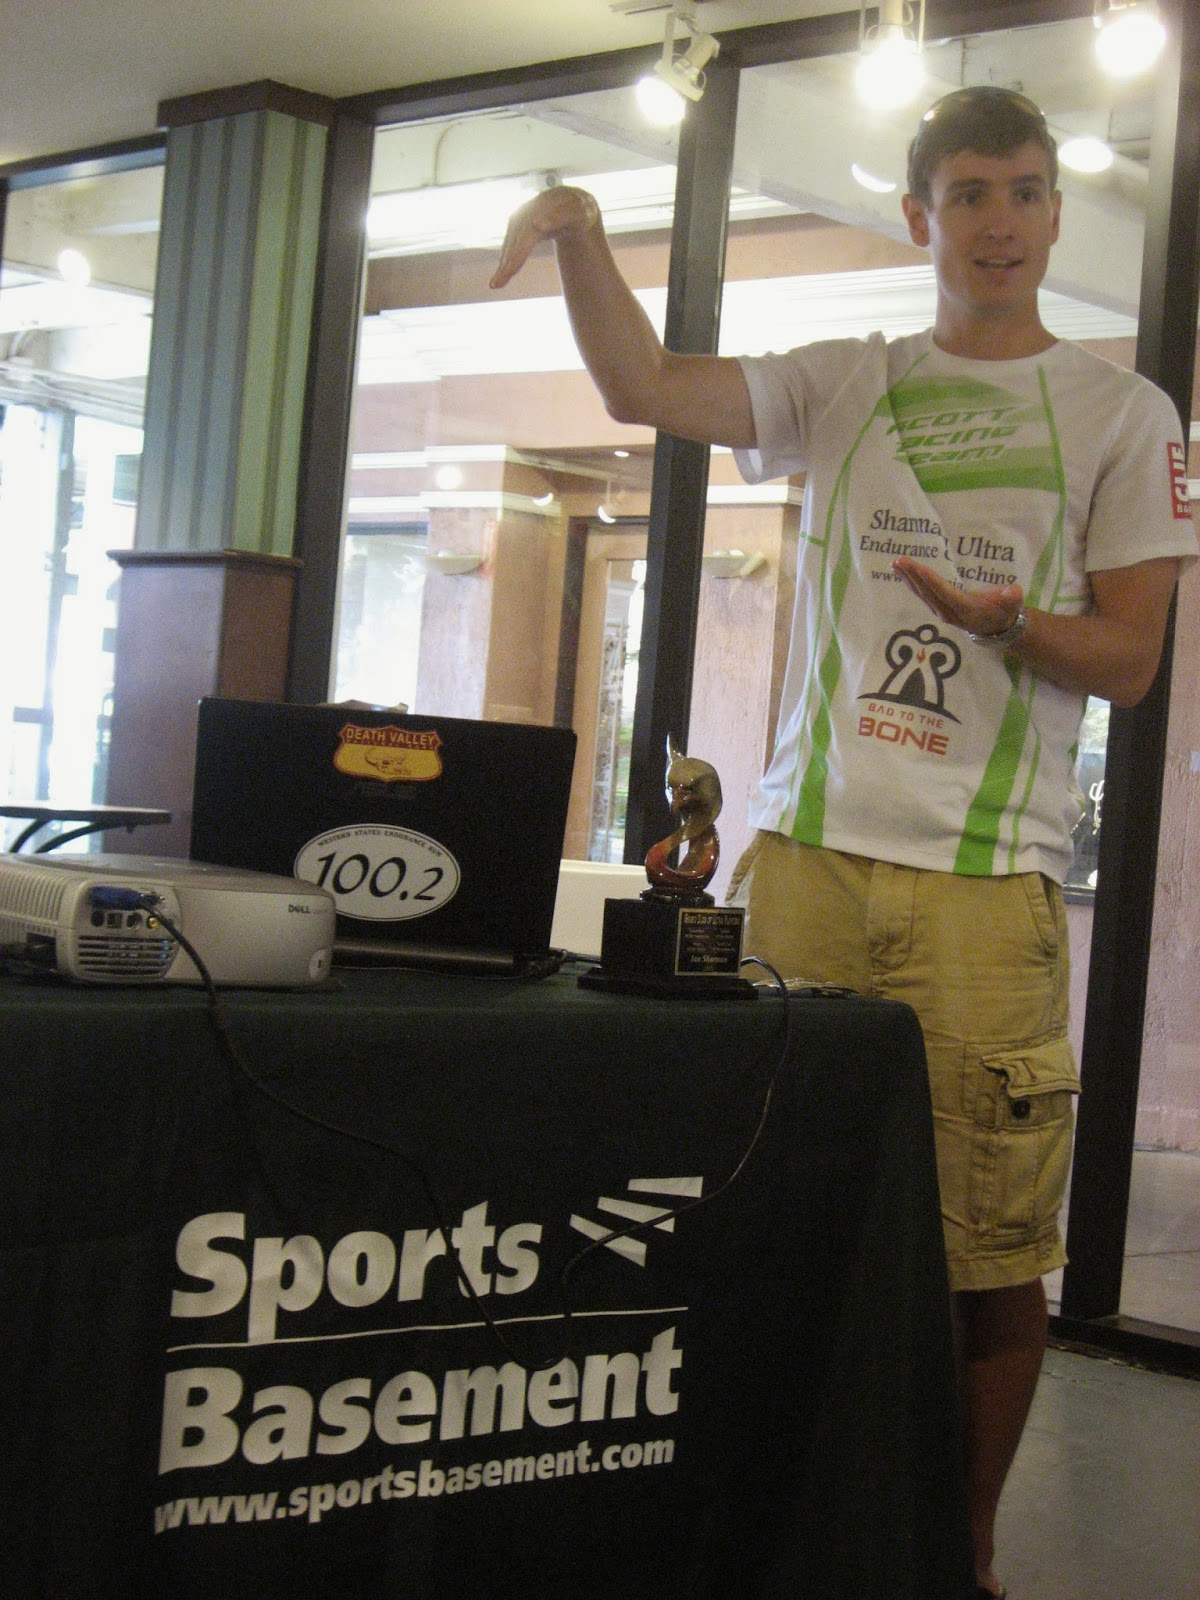 running my second job and passion ian sharman an ultra champion